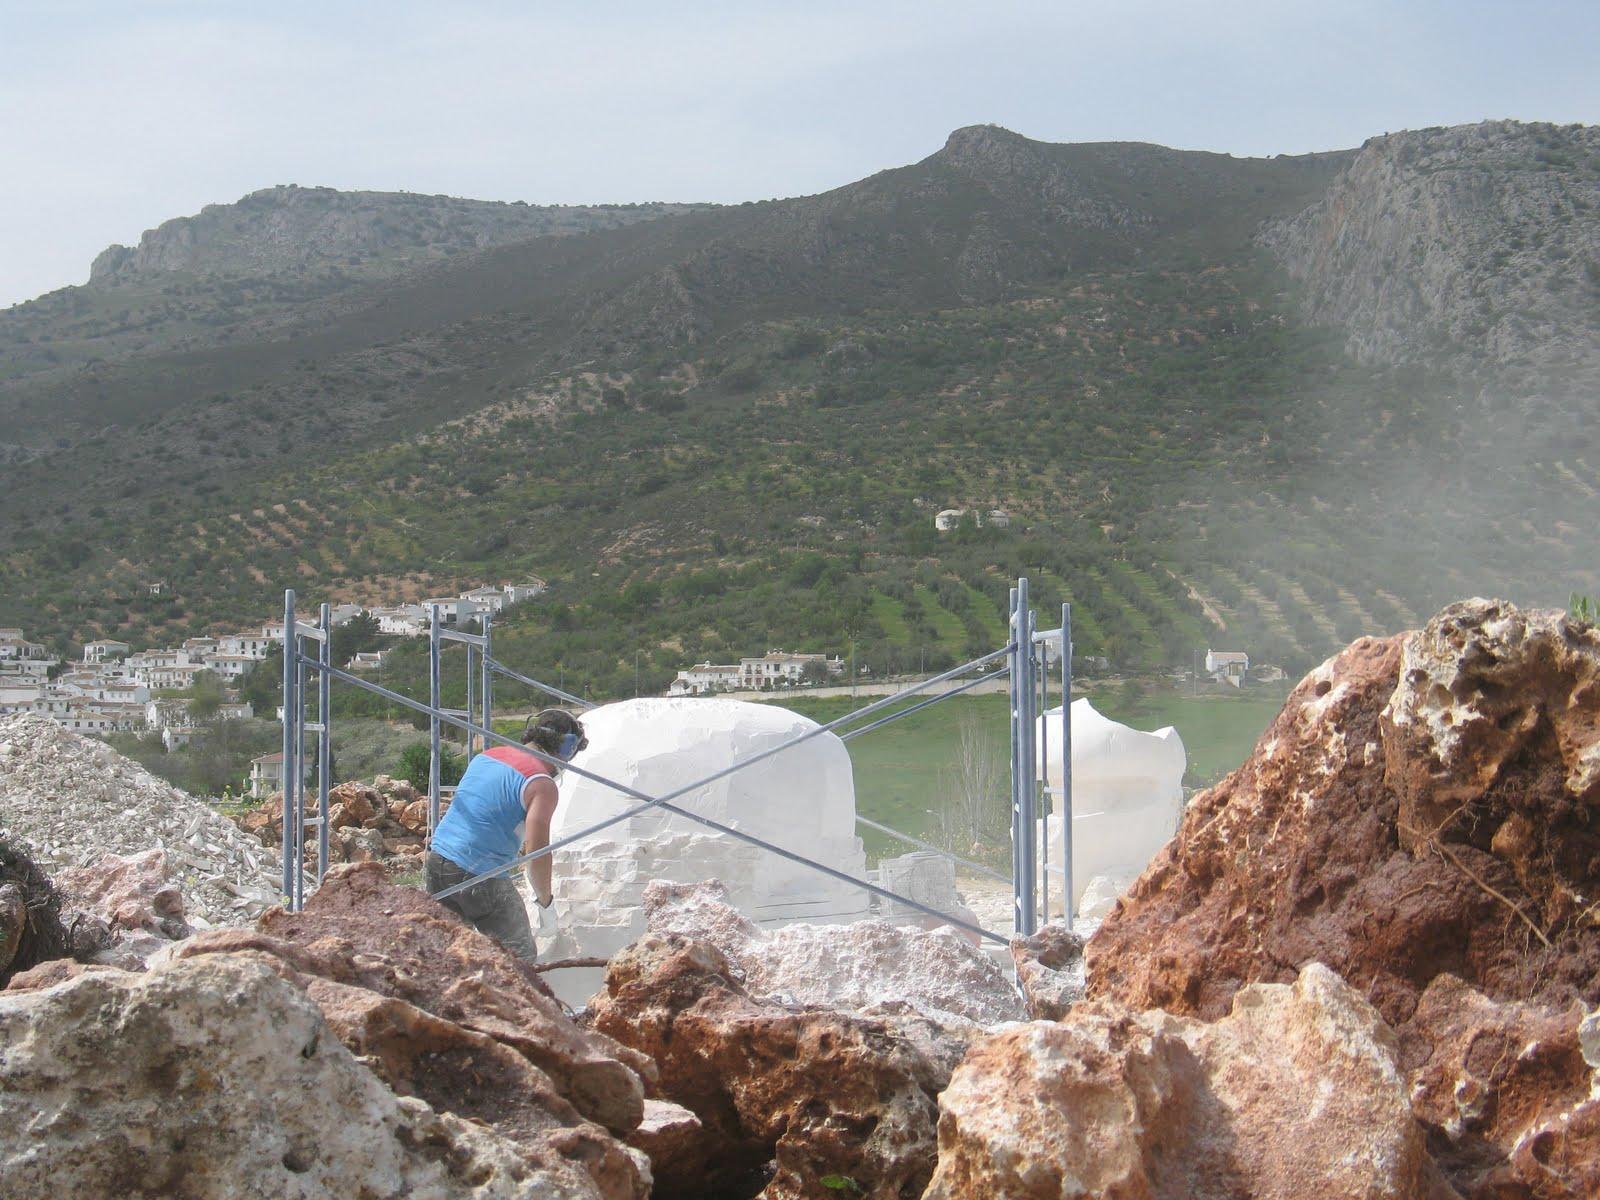 Gurumelo en la bolva de piedra proceso escultura for Jardin micologico la trufa